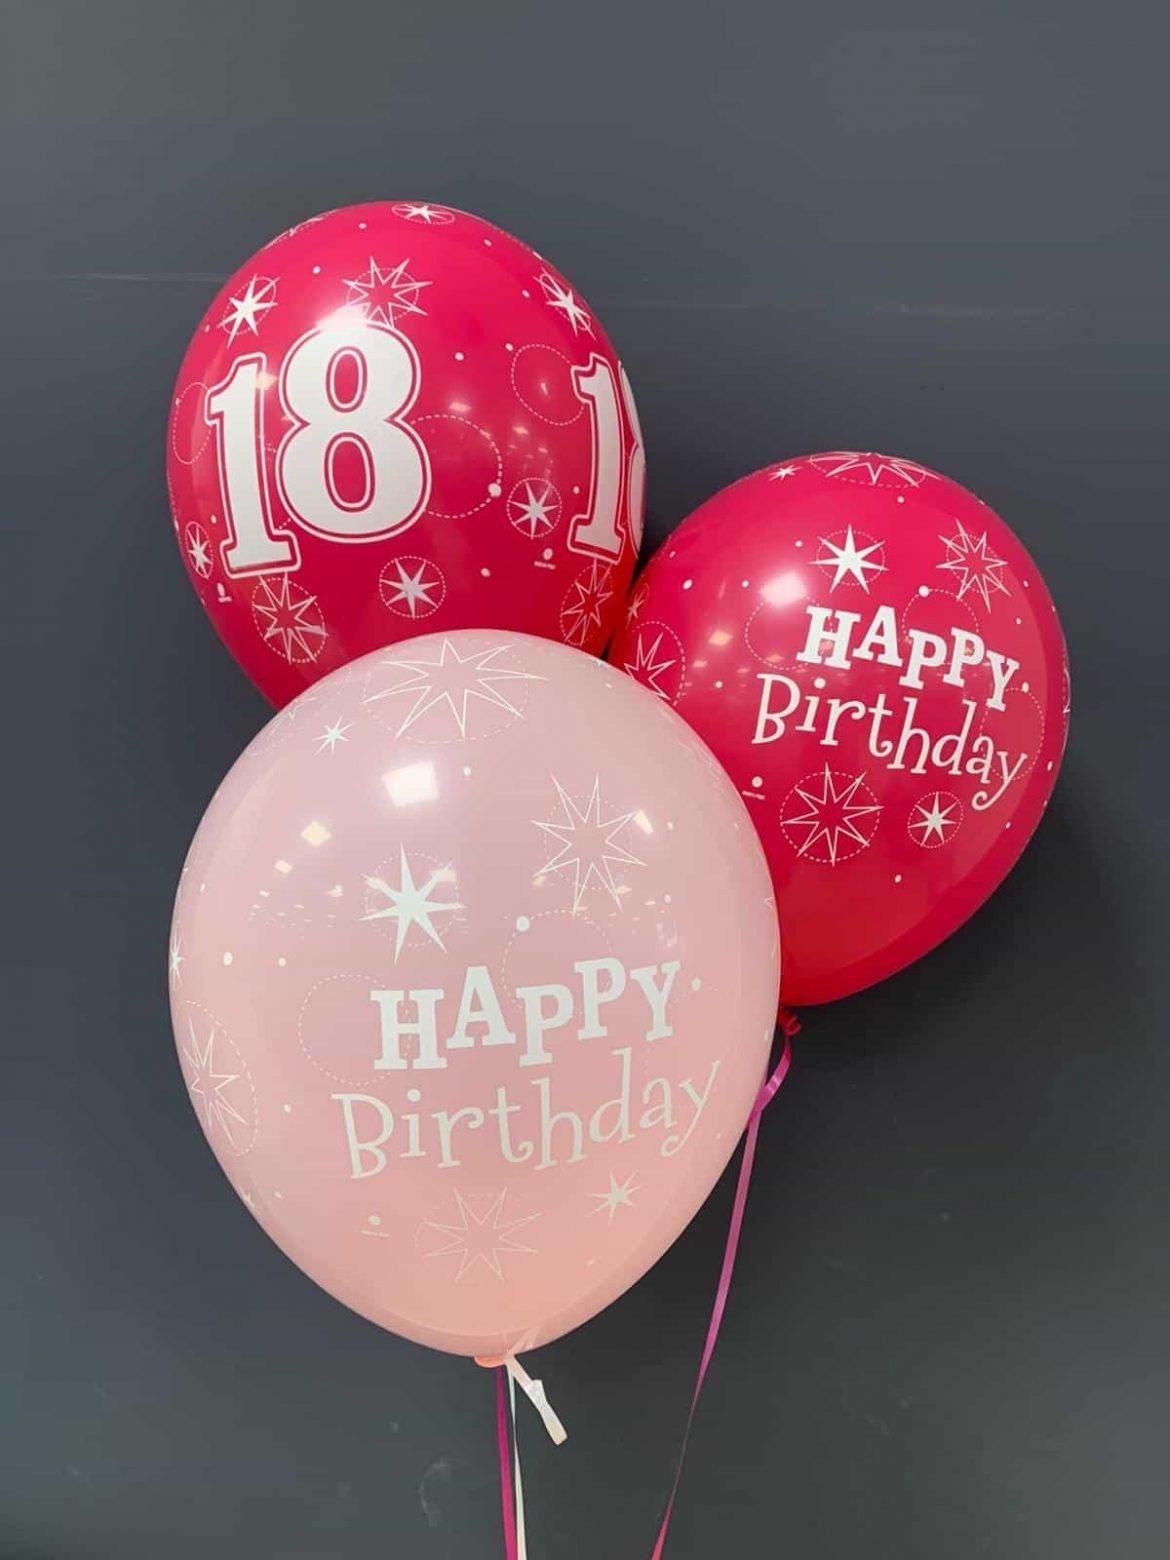 Happy Birthday Latexballons je € 2,20 1